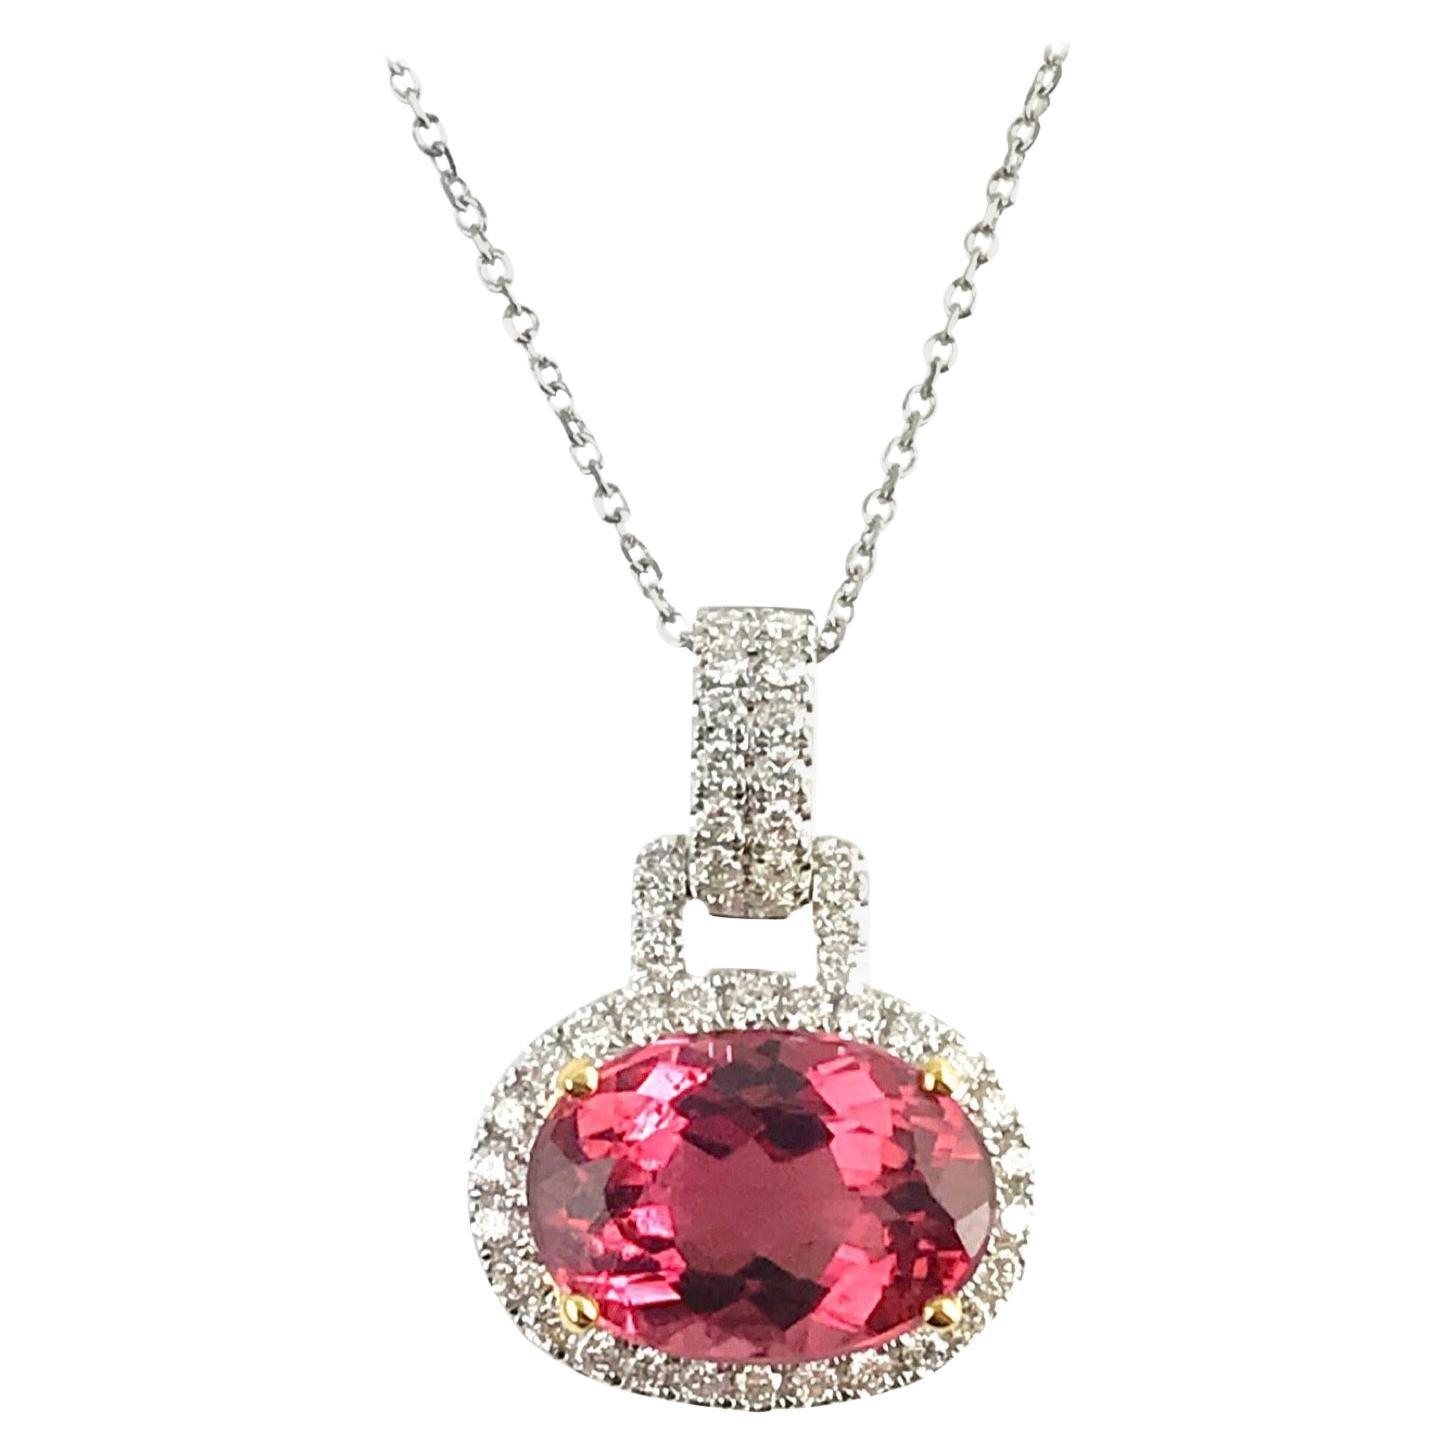 DiamondTown 3.9 Carat Oval Cut Raspberry Tourmaline and Diamond Pendant